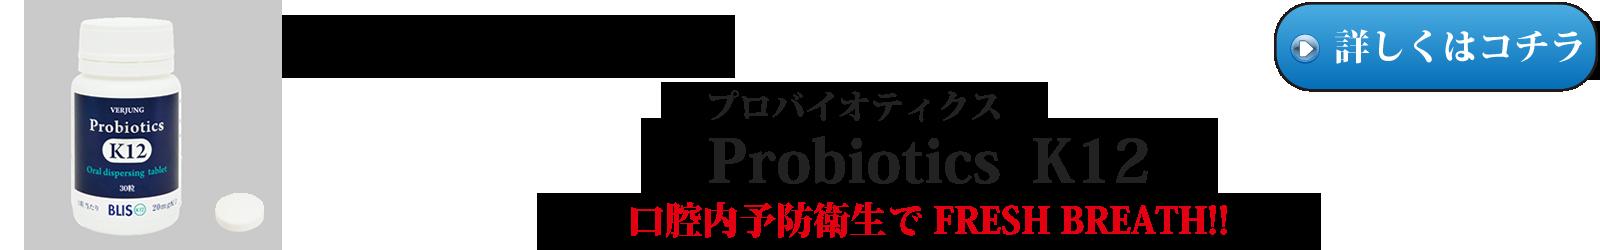 probioticsk12